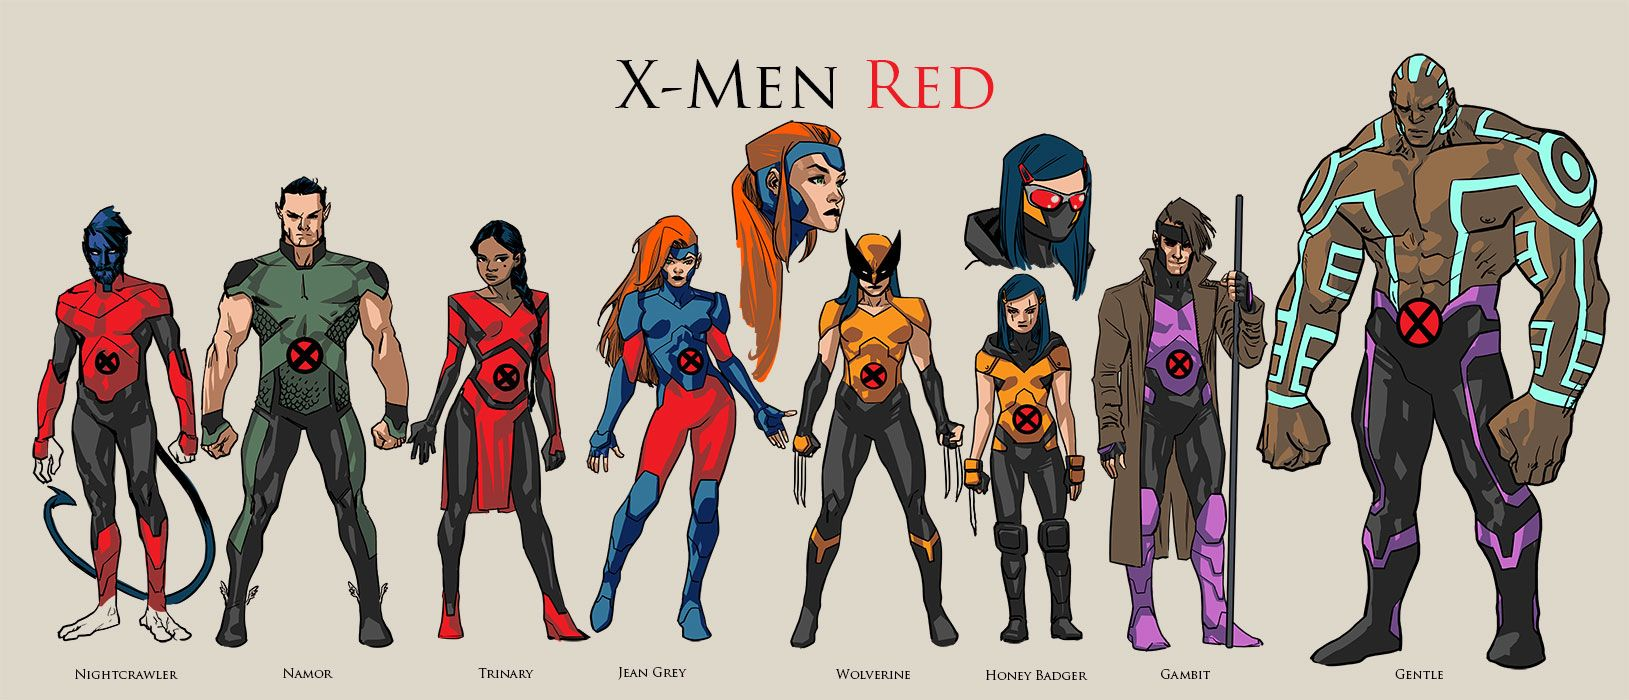 Mahmud Asrar On Twitter In 2021 Xmen Comics Marvel Books Marvel Characters